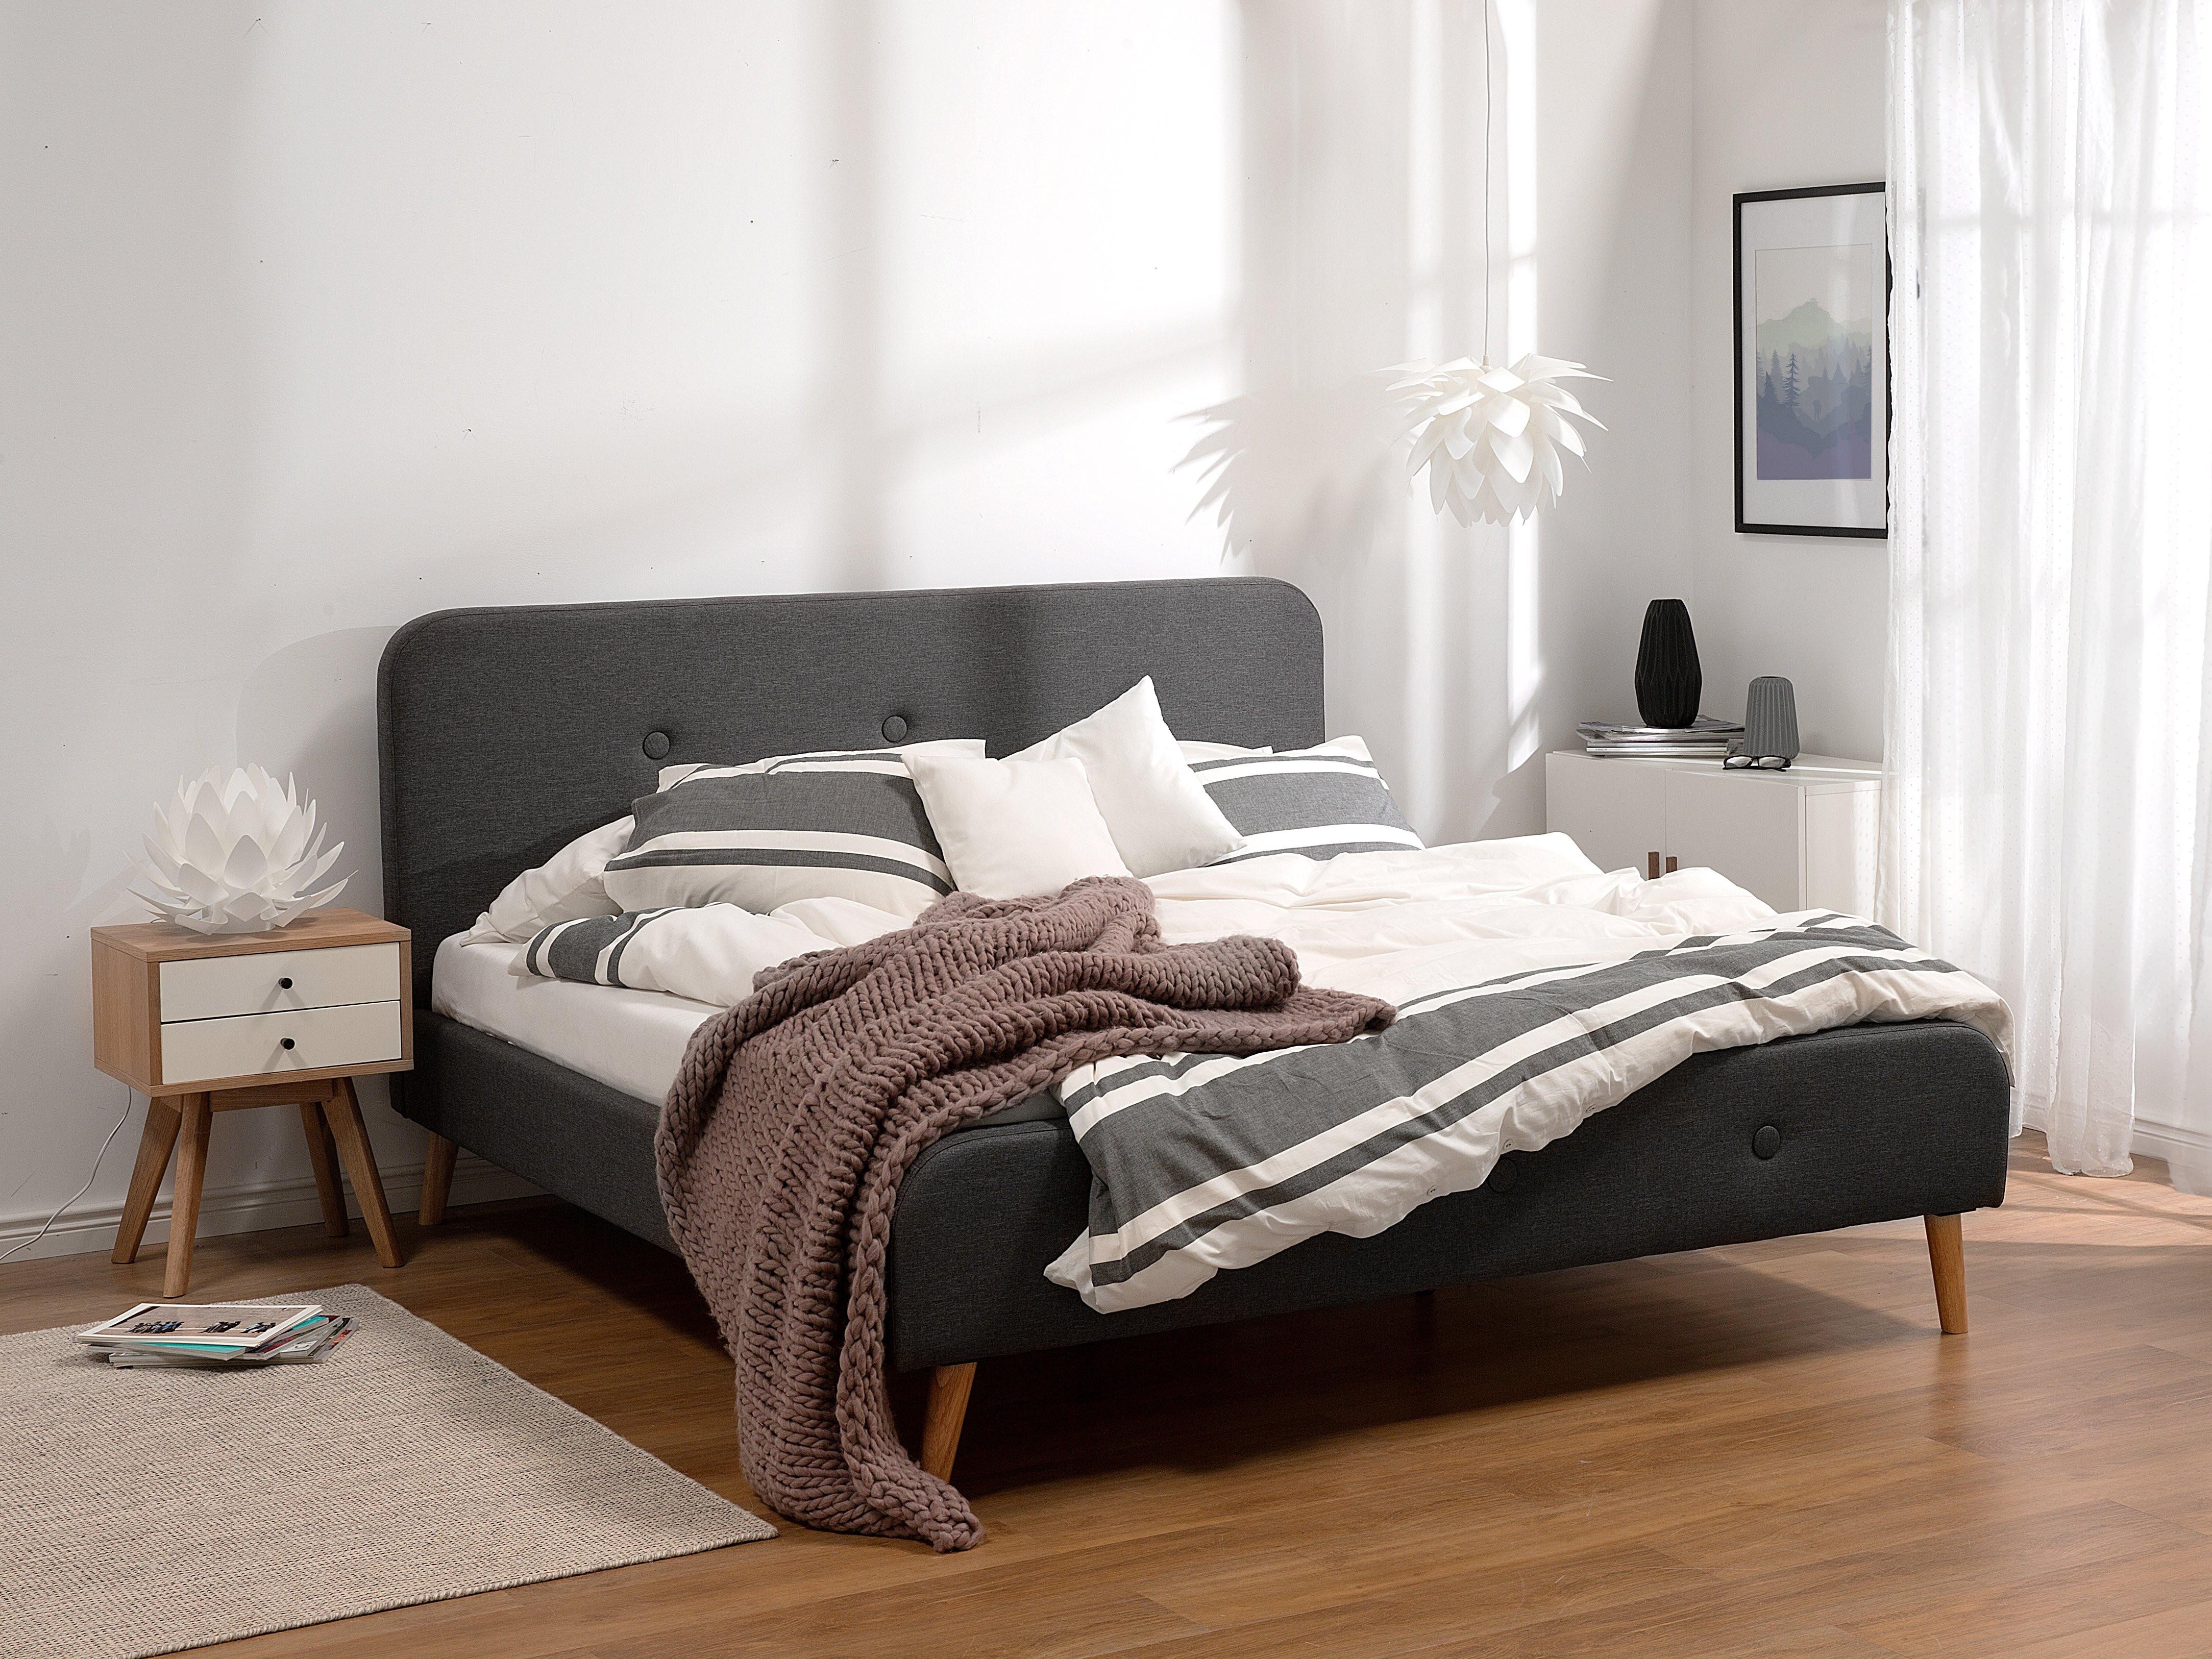 Bett 24  Bett 24 De Awesome Fotos Disselkamp Coretta Doppelbett